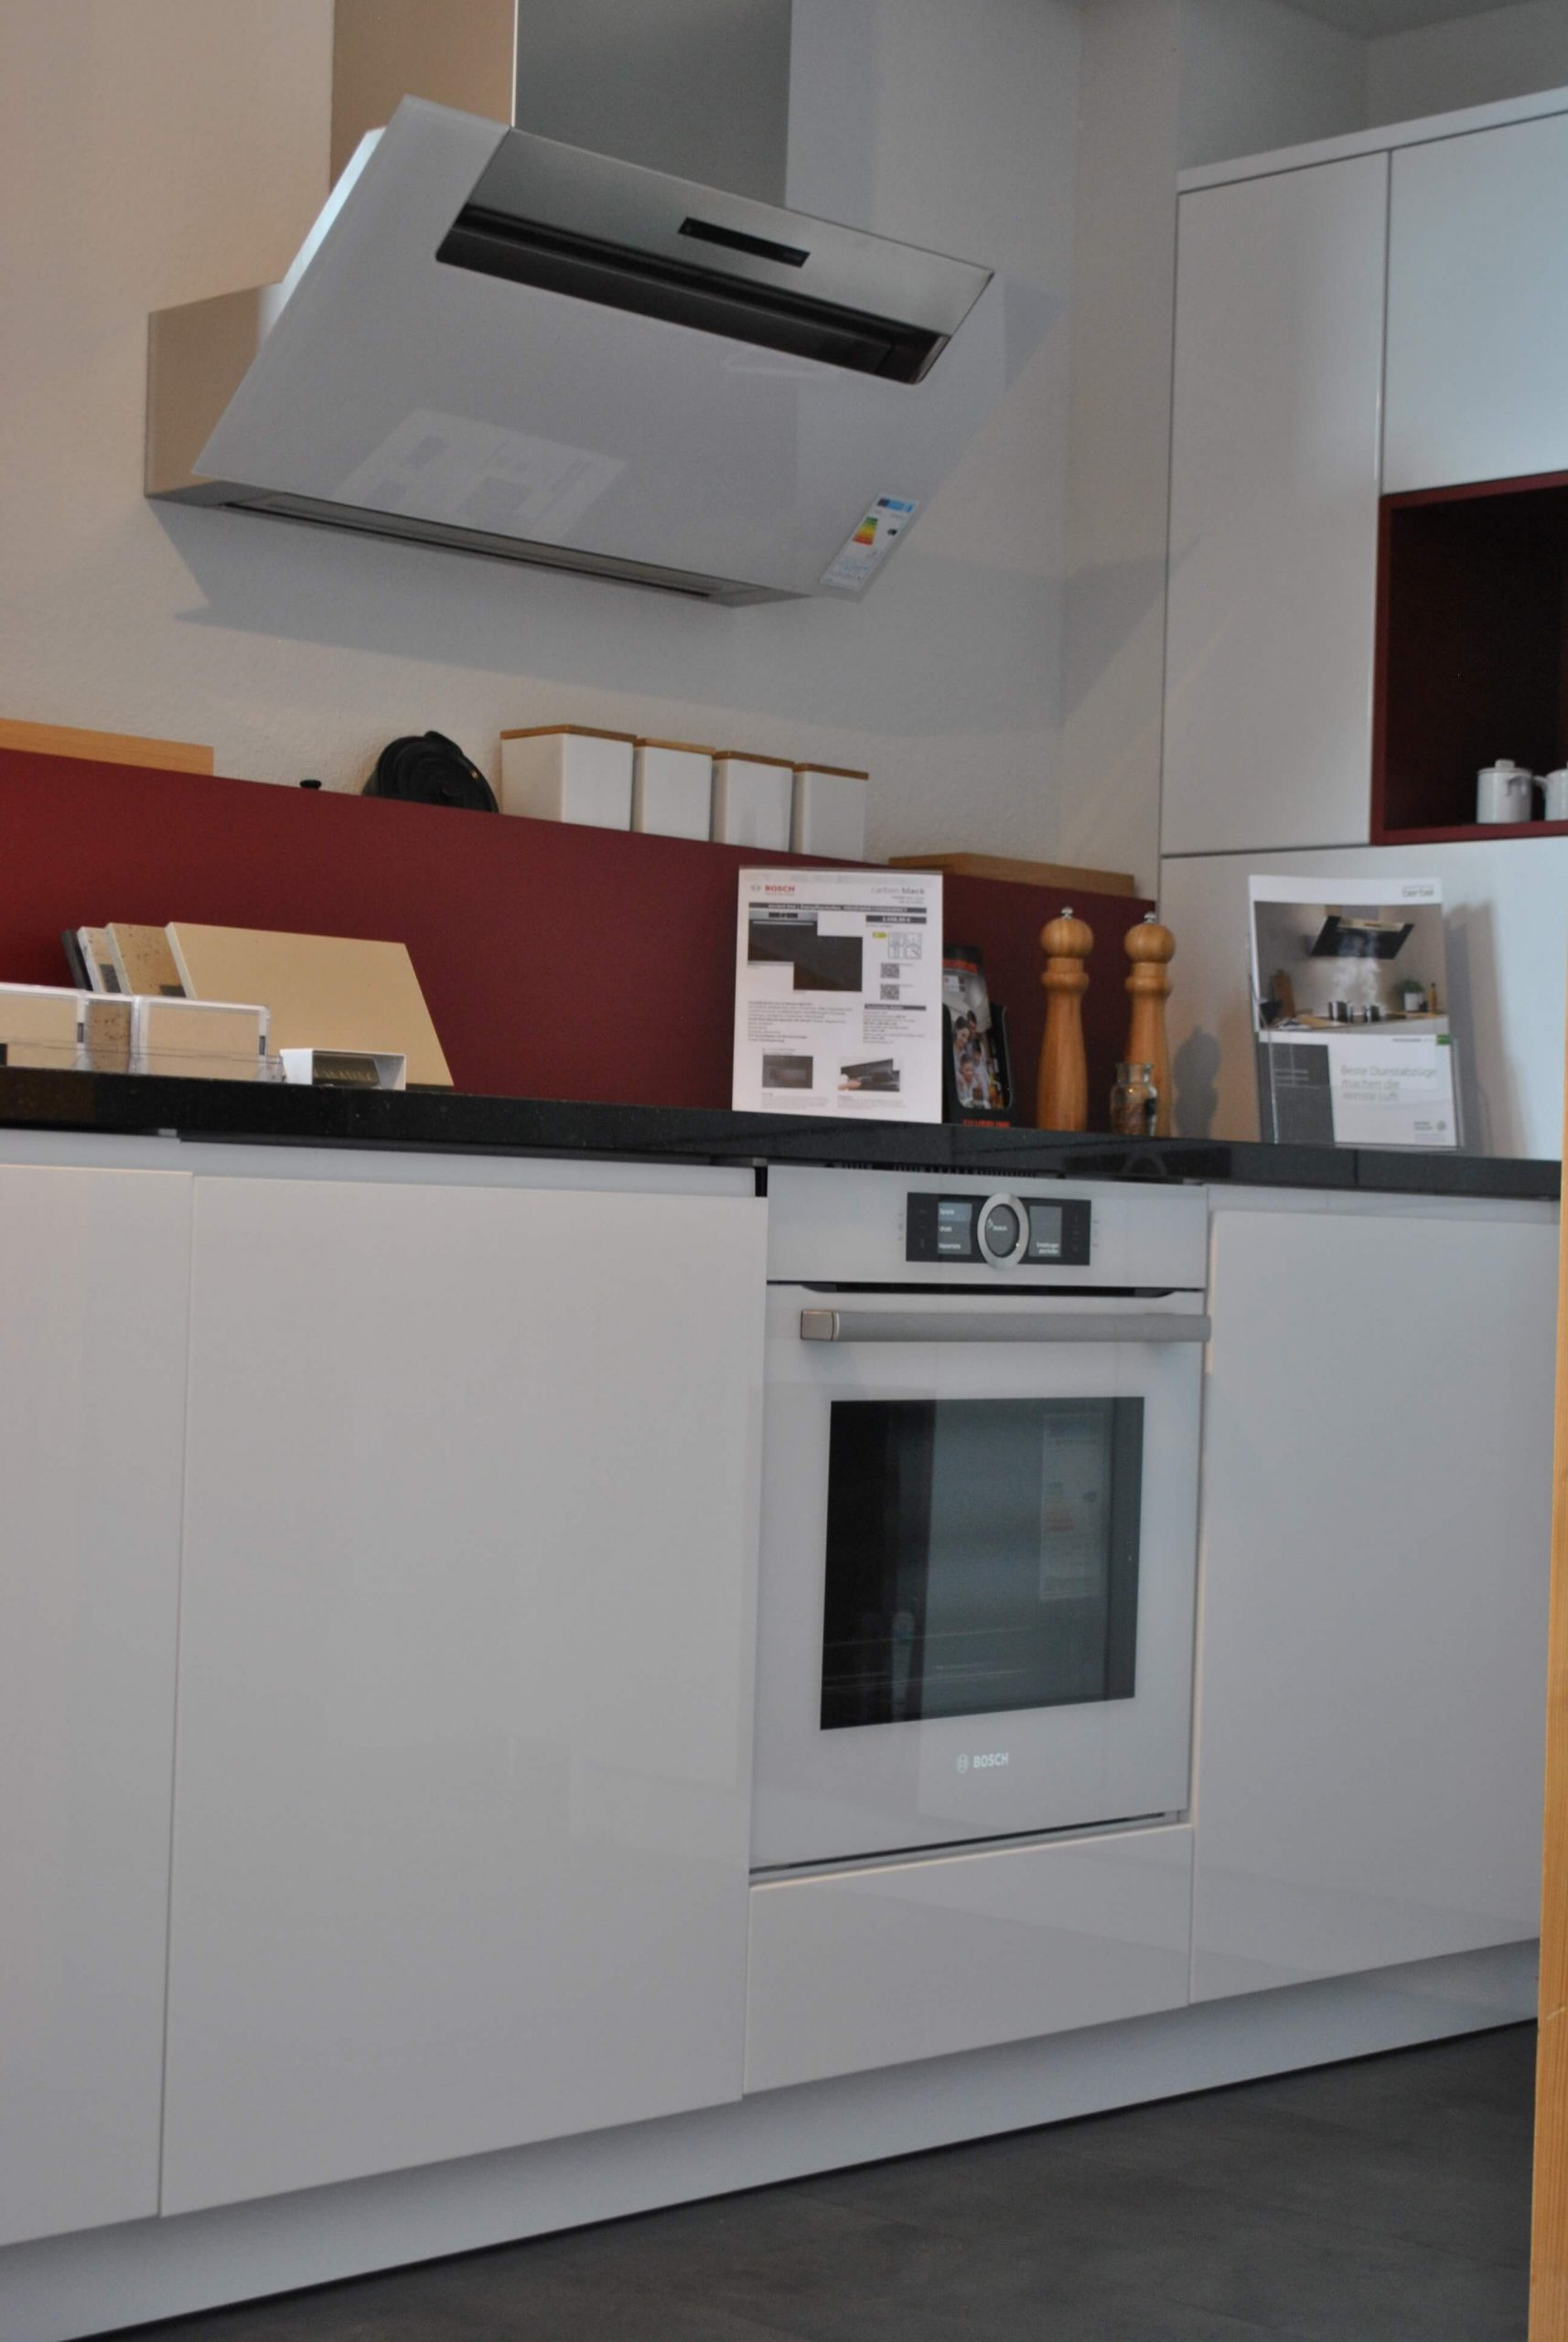 Full Size of Küche Mit Geräten Kche Alea Inkl Gerten Kppler Doppelblock Bodenbelag Müllsystem Miniküche Kühlschrank Vorratsdosen Inselküche Abverkauf Ohne Küche Küche Mit Geräten